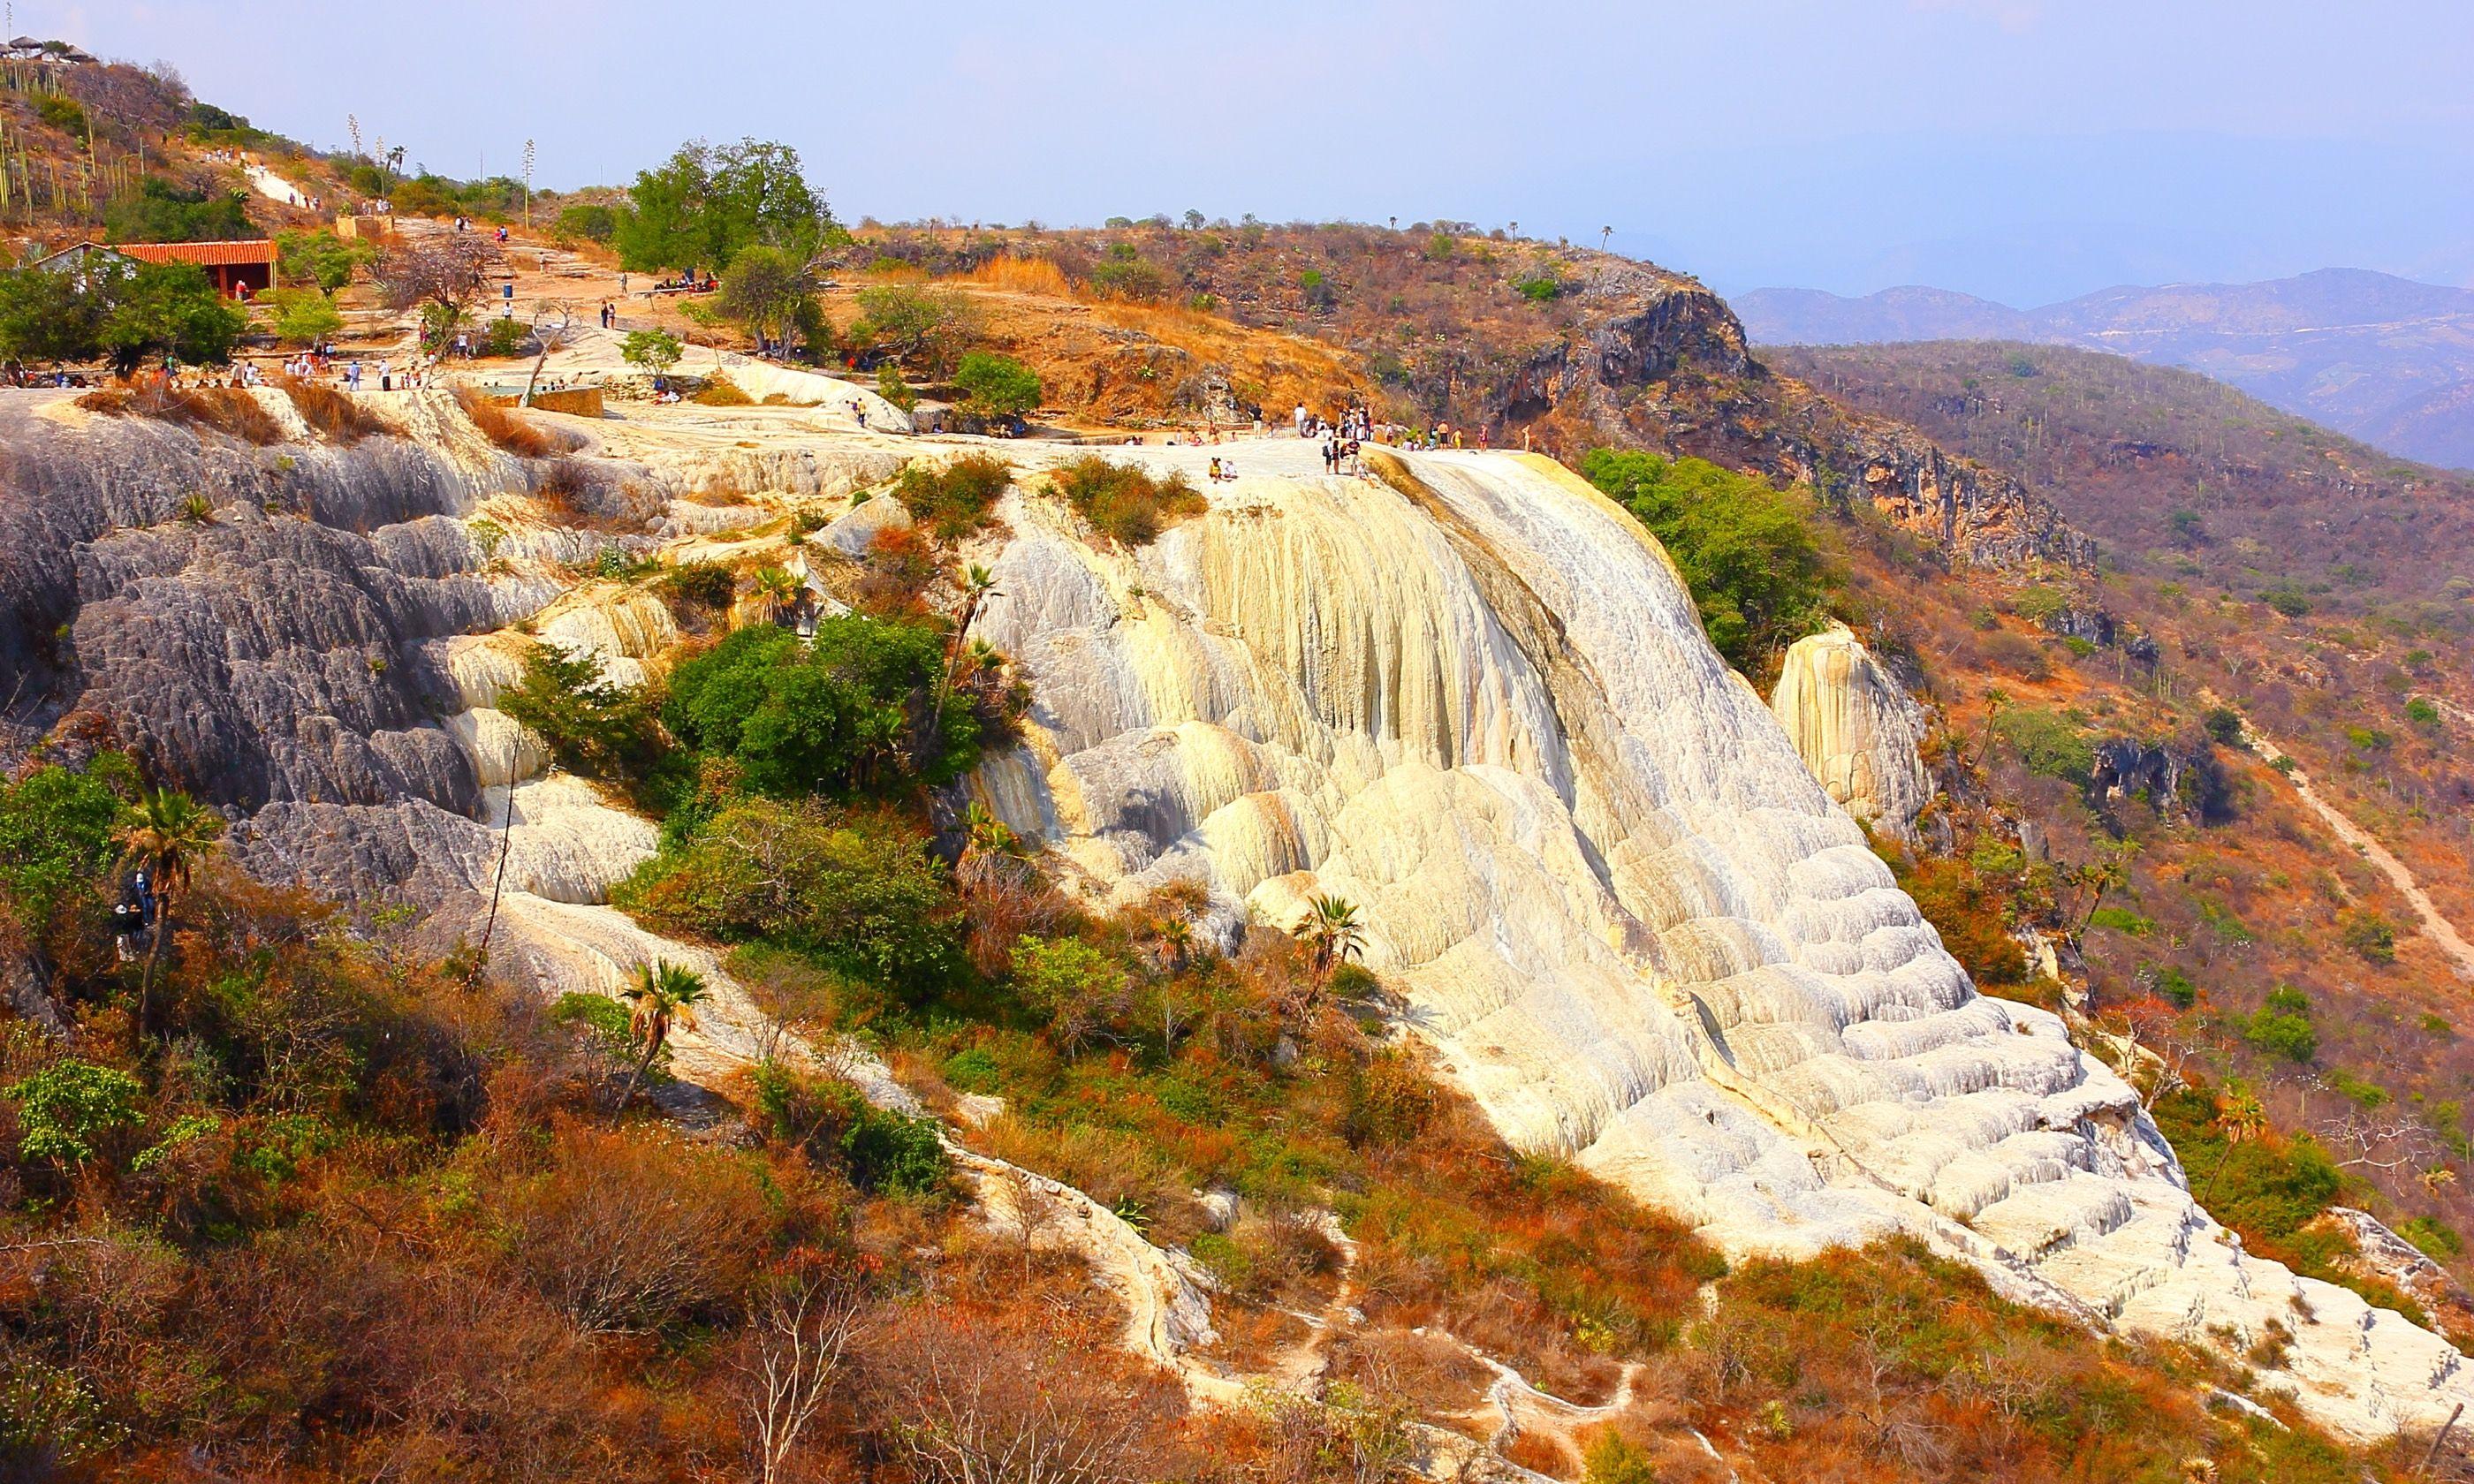 Petrified waterfall at Hierve el Agua (Dreamstime)